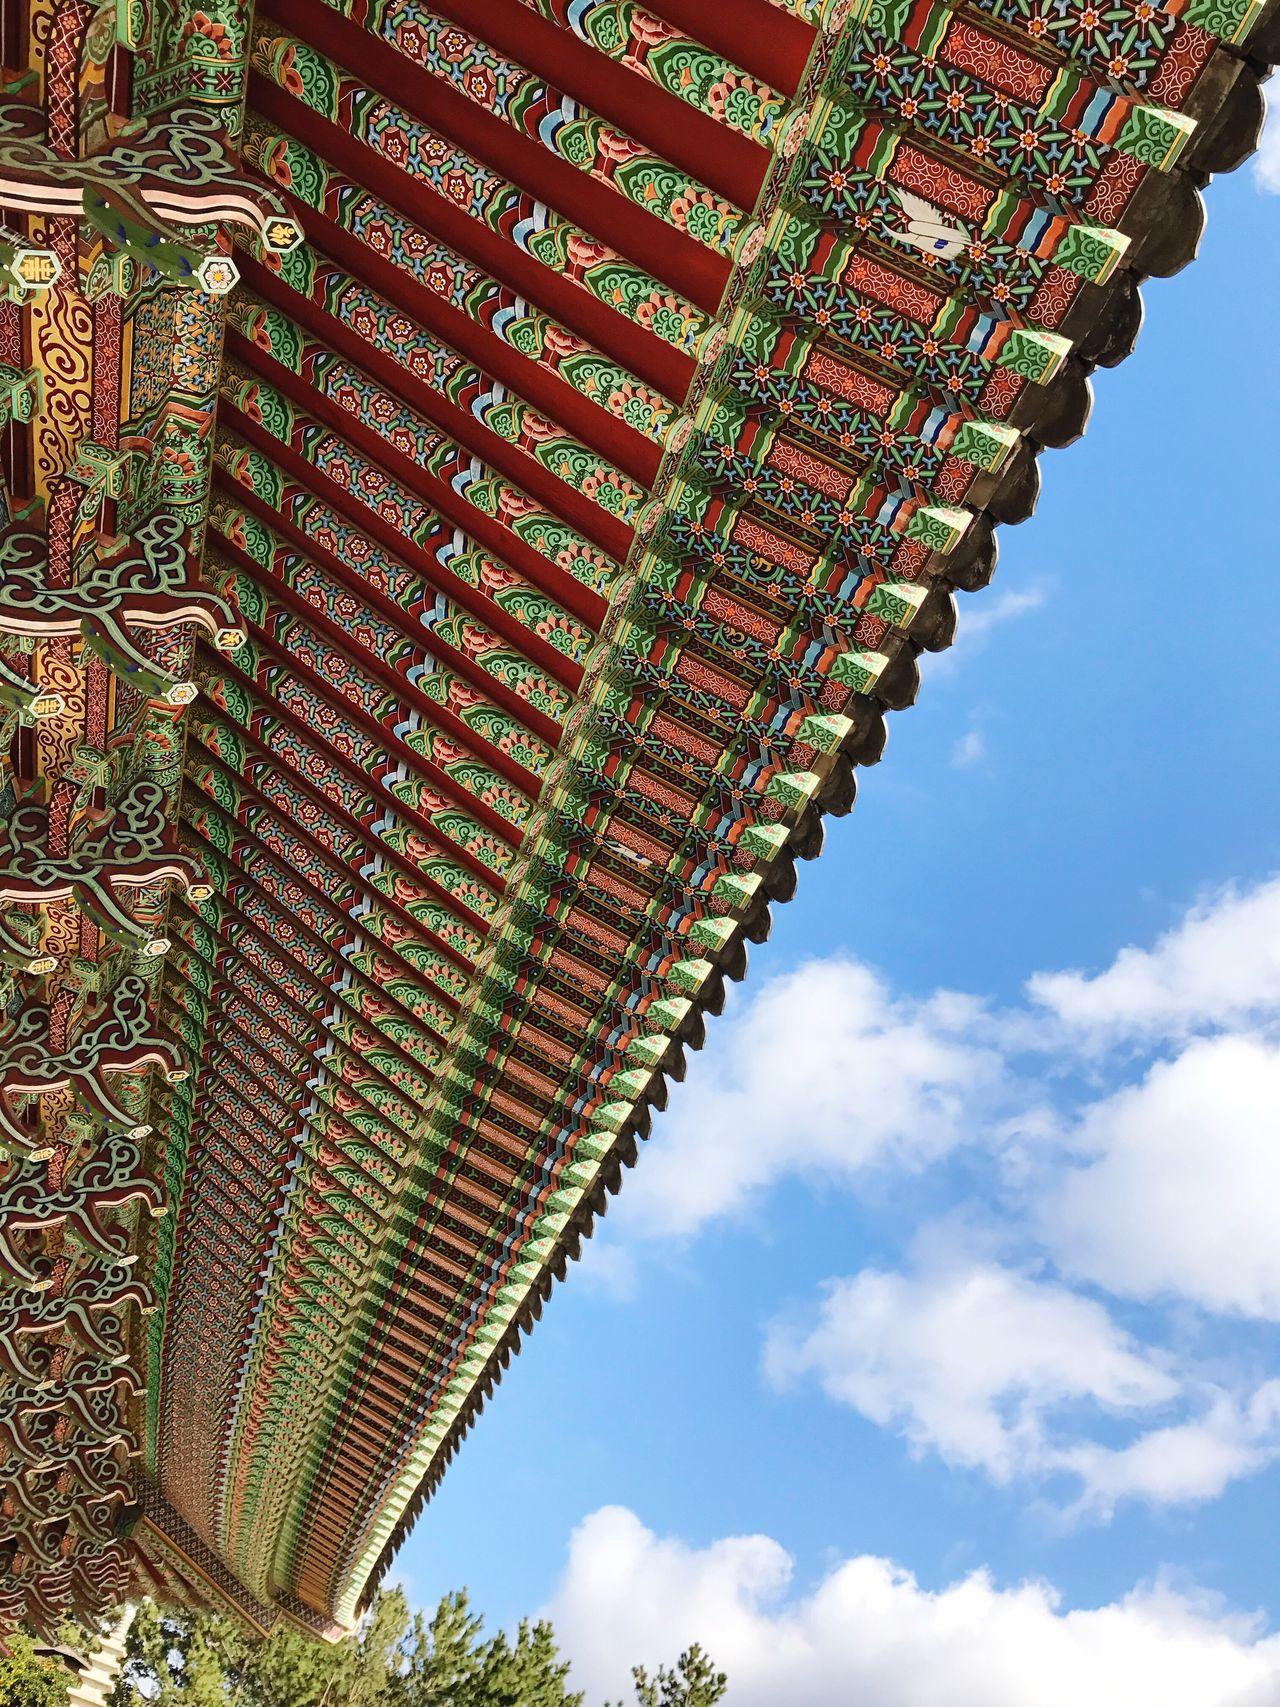 Roof Temple Jeju Island, Korea Architecture Built Structure Sky Outdoors Nature Culture